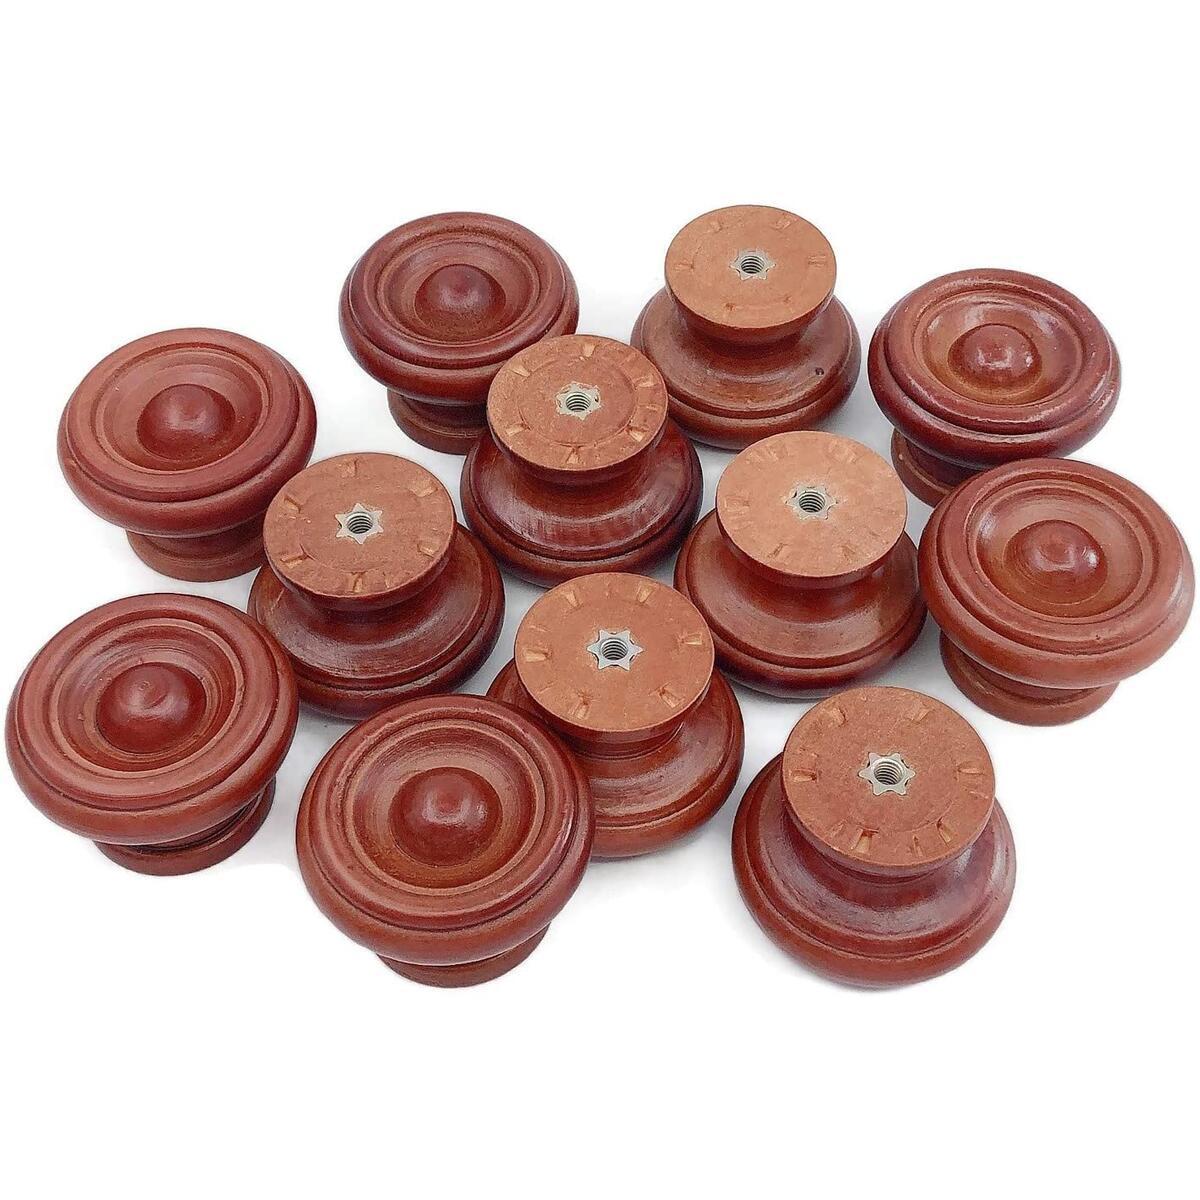 Cabinet Knobs, Wooden Drawer knob, Drawer Pull, Drawer knob, and Dresser Hardware, for Dresser Drawer Wardrobe, Mushroom Brown Color (12)